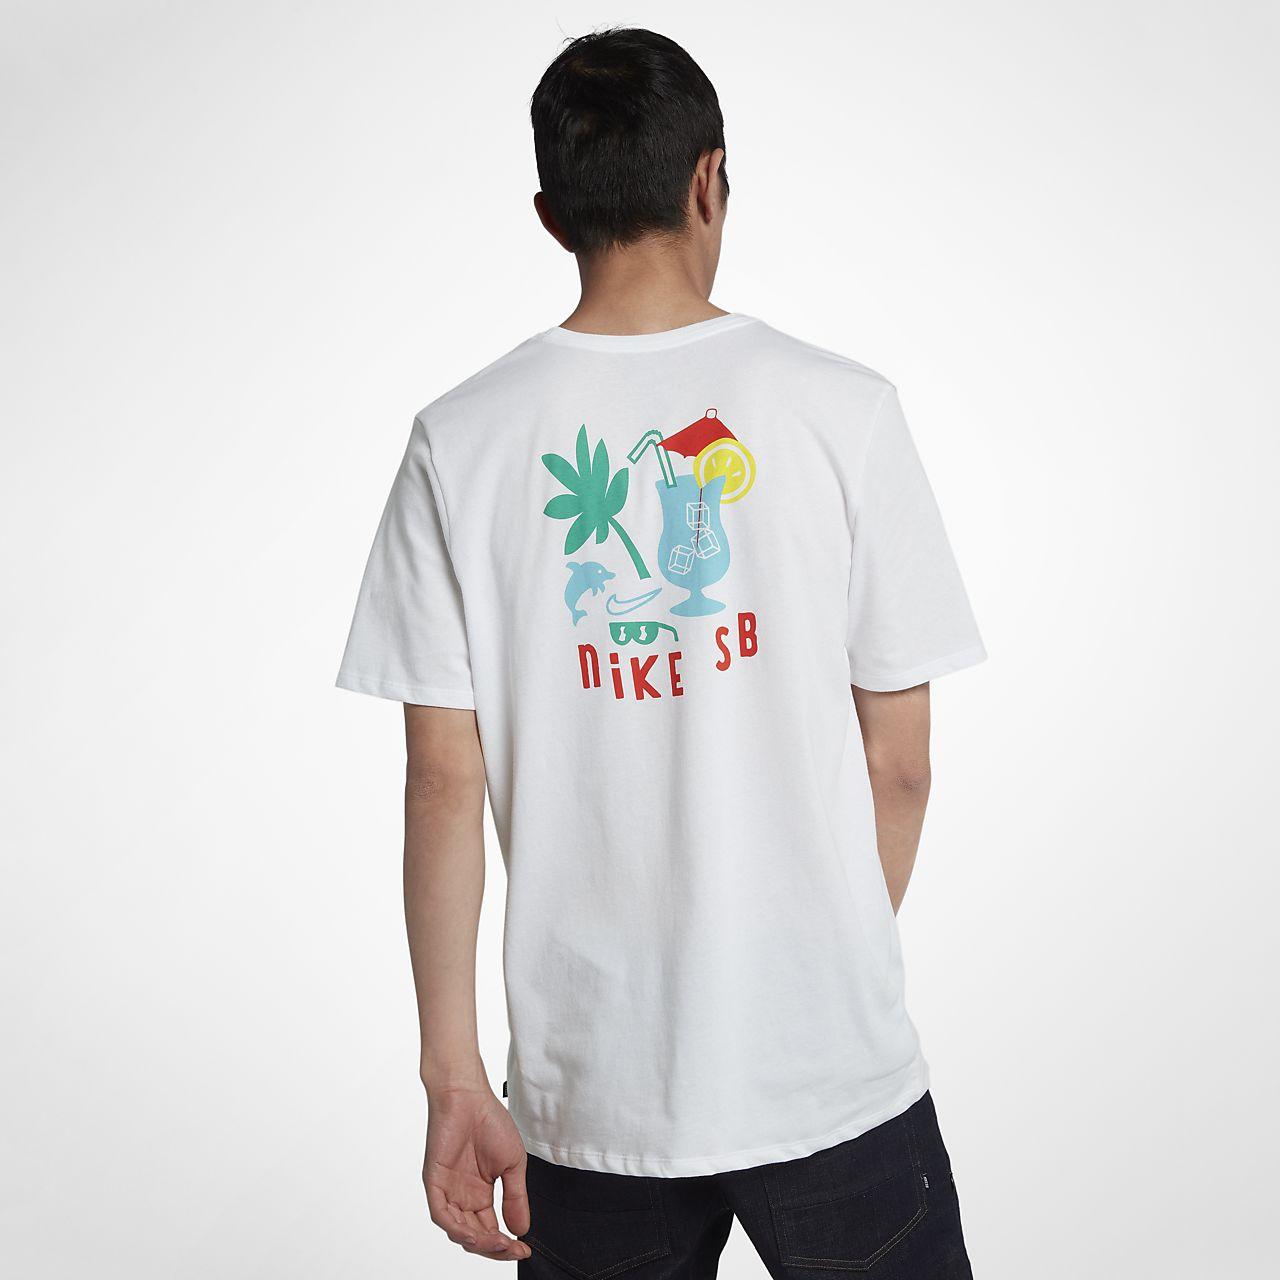 477a570f Nike Sb Cat Scratch T Shirt Uk - DREAMWORKS